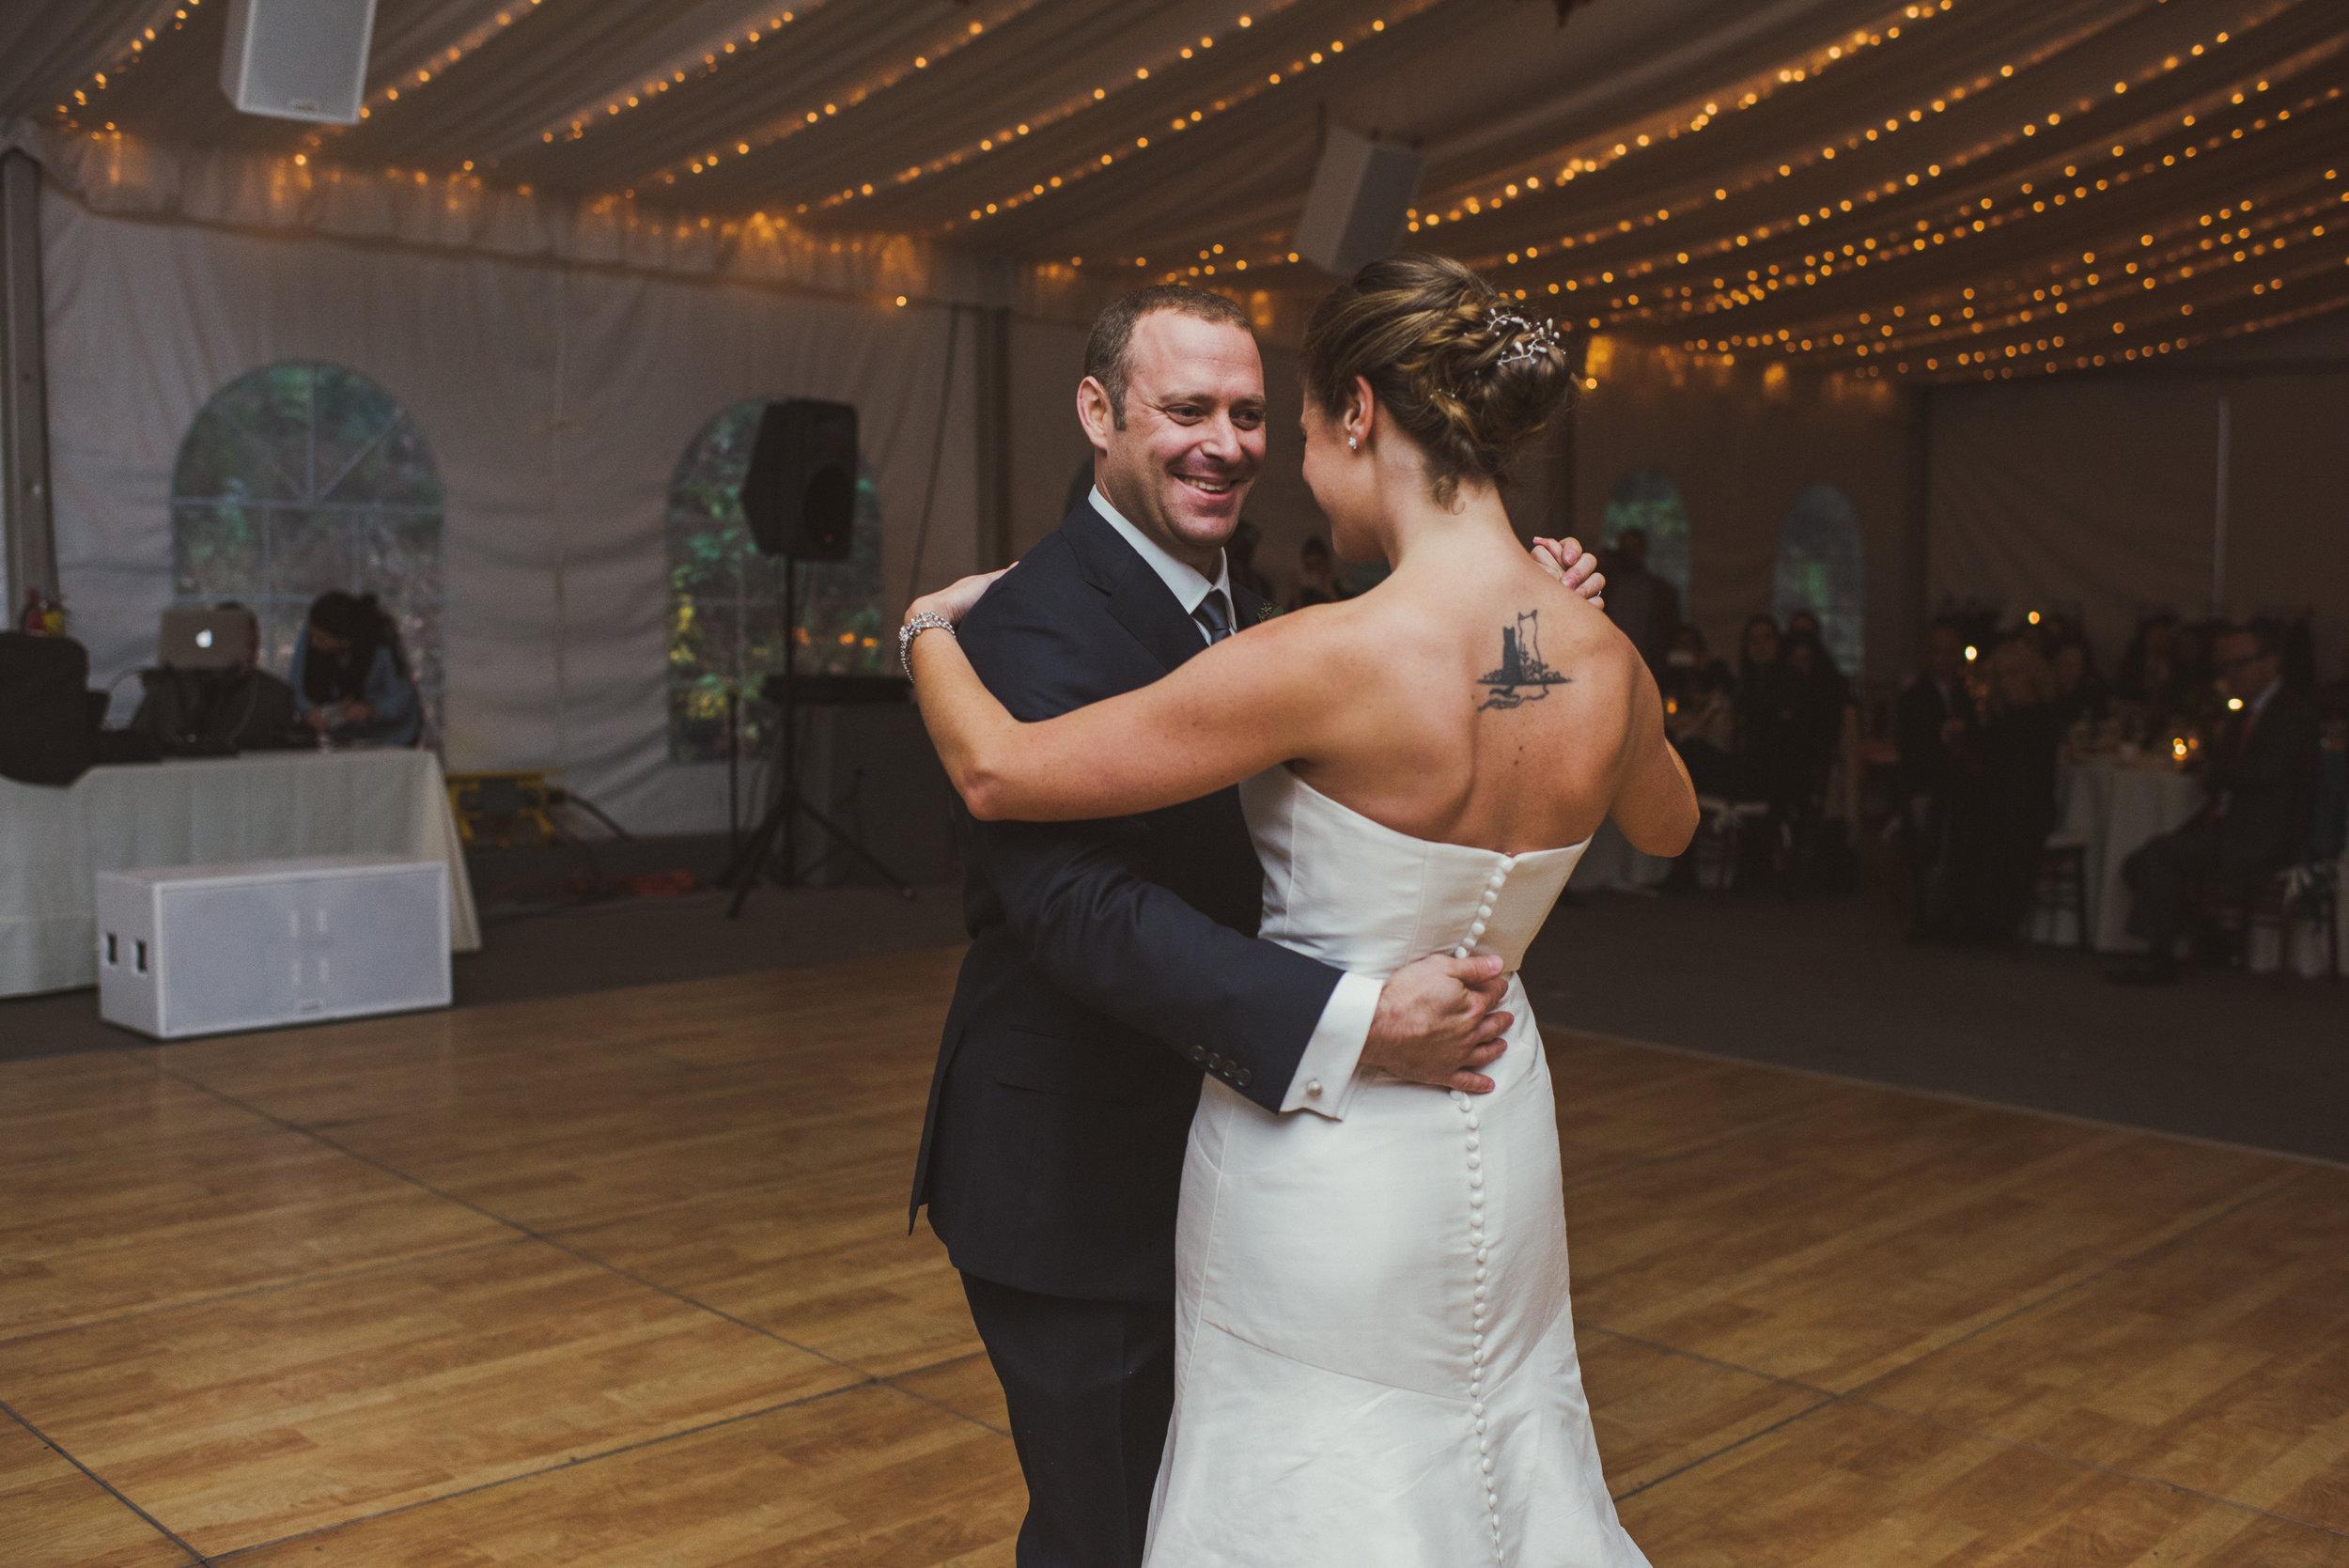 JACQUELINE & ANDREW WARSHAWER -BROOKMILL FARM FALL WEDDING - INTIMATE WEDDING PHOTOGRAPHER - TWOTWENTY by CHI-CHI AGBIM-478.jpg